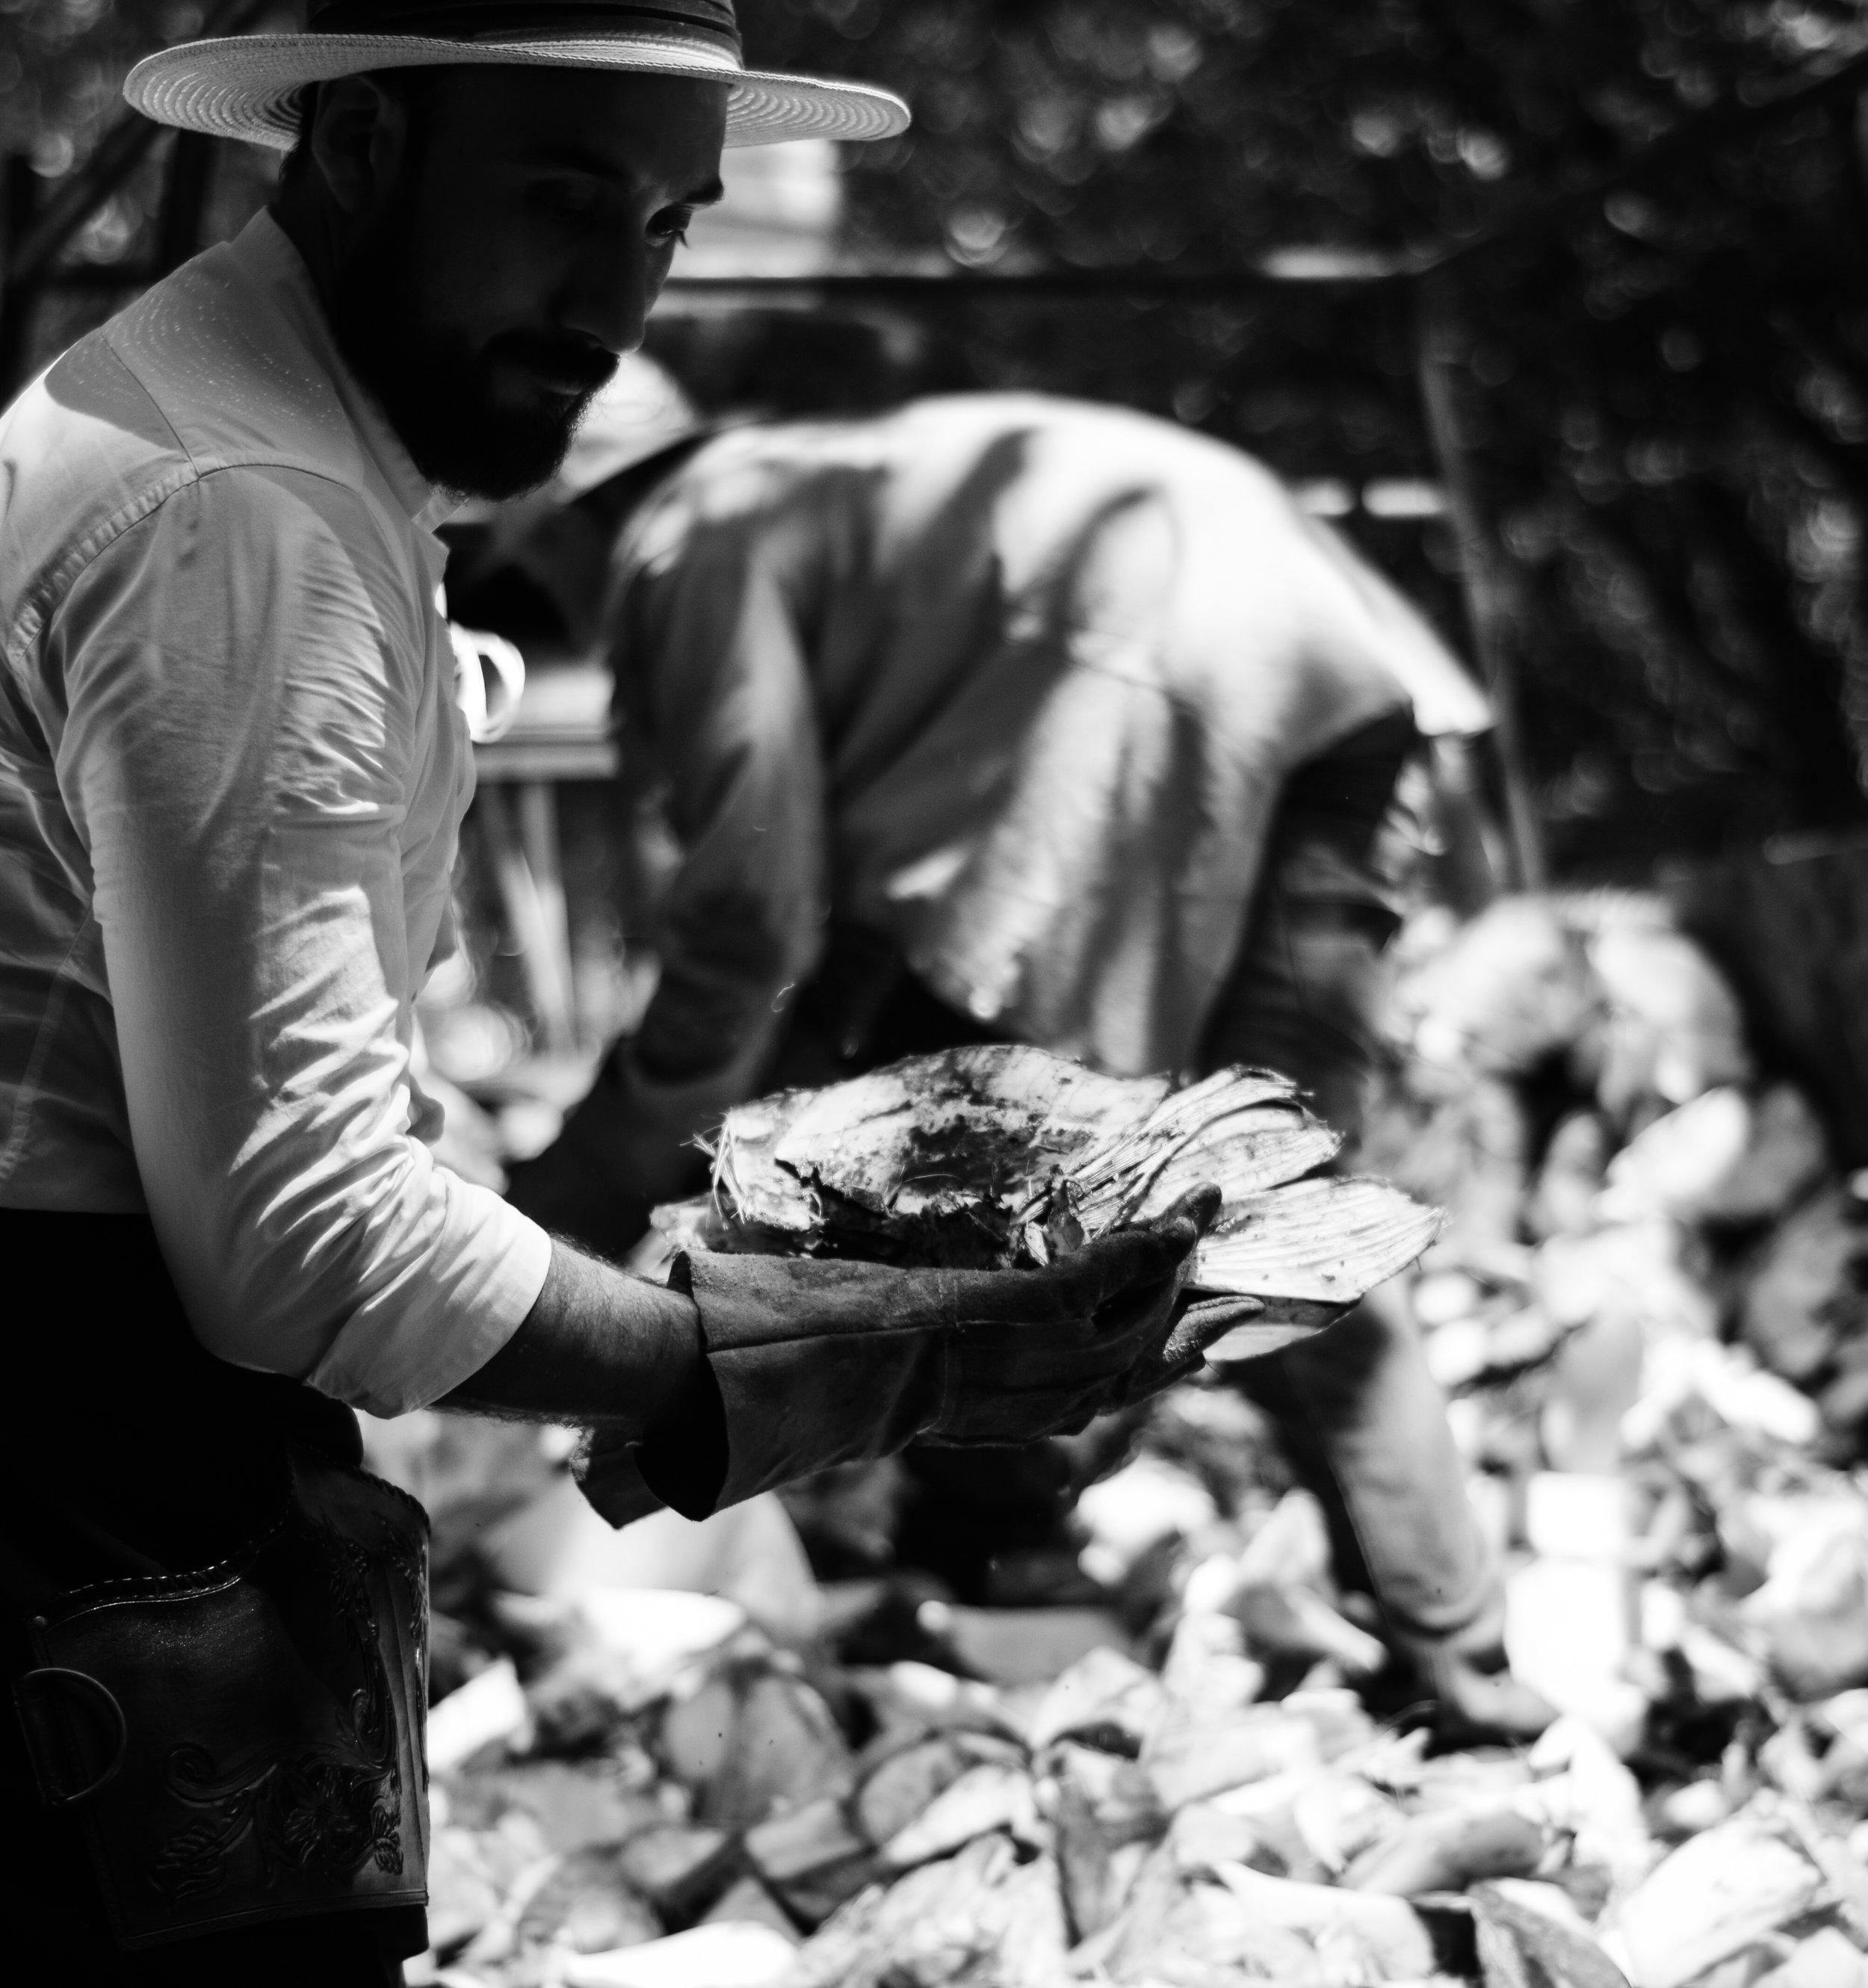 Harvesting Agave Ninfa Raicilla